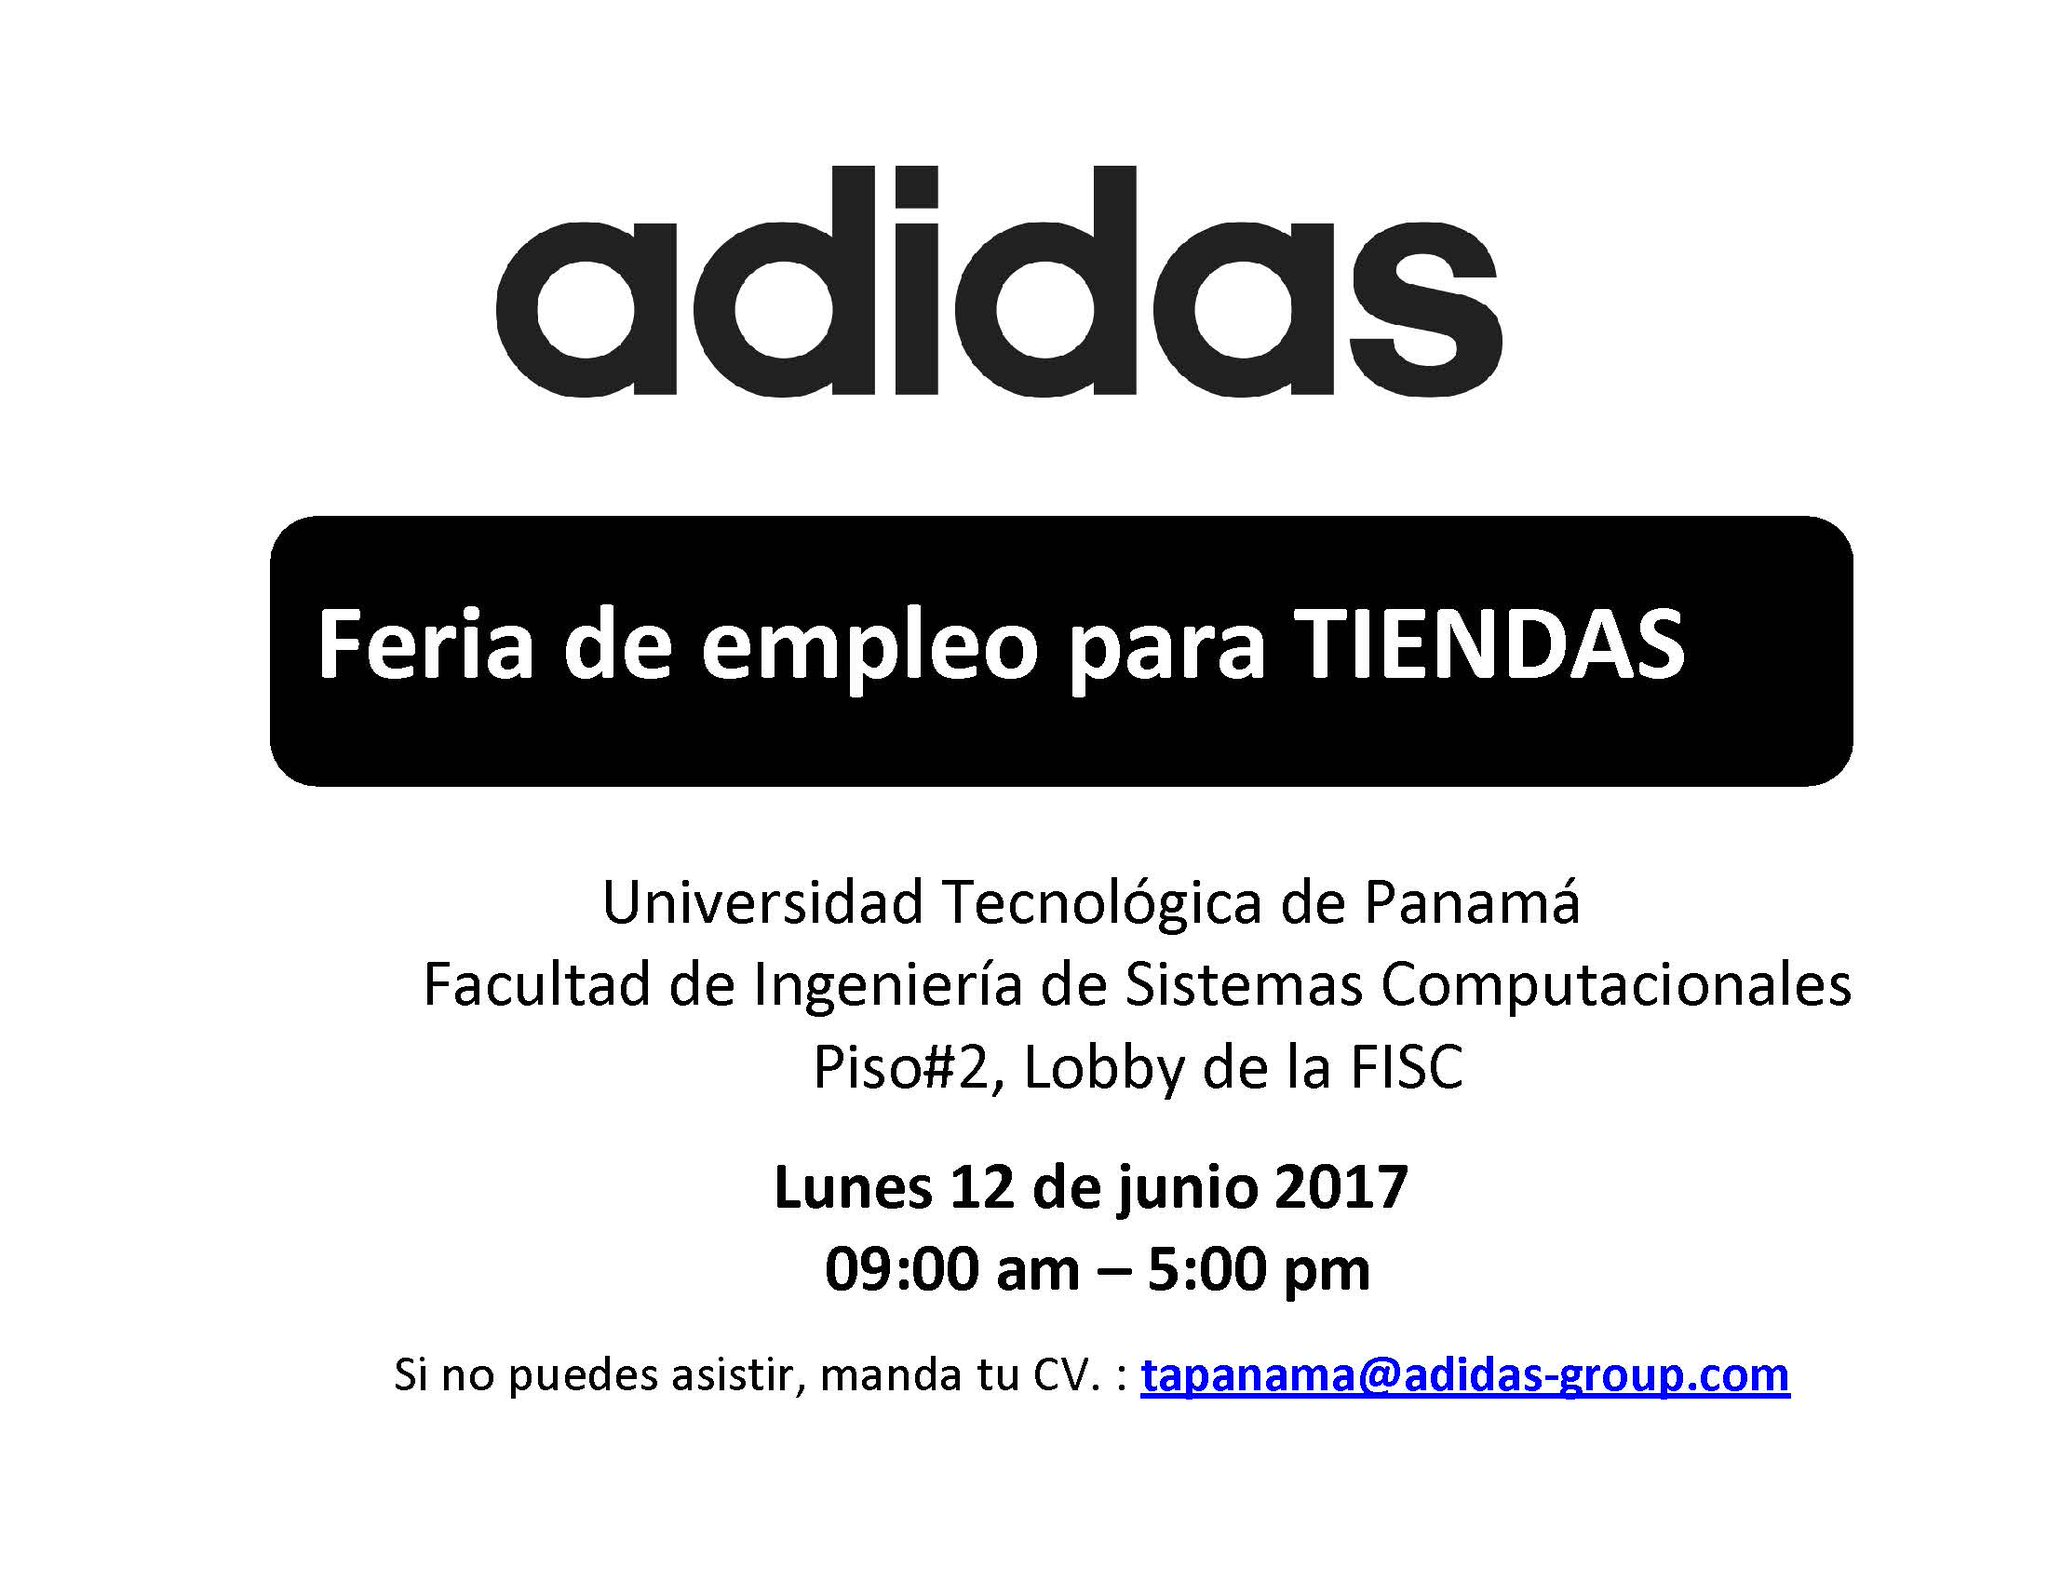 "primer ministro Increíble Característica  Uživatel FISC UTP na Twitteru: ""Feria de empleo para Tiendas Adidas, Lunes  12 de junio 2017, Lobby de la FISC, 09:00 am – 5:00 pm.… """